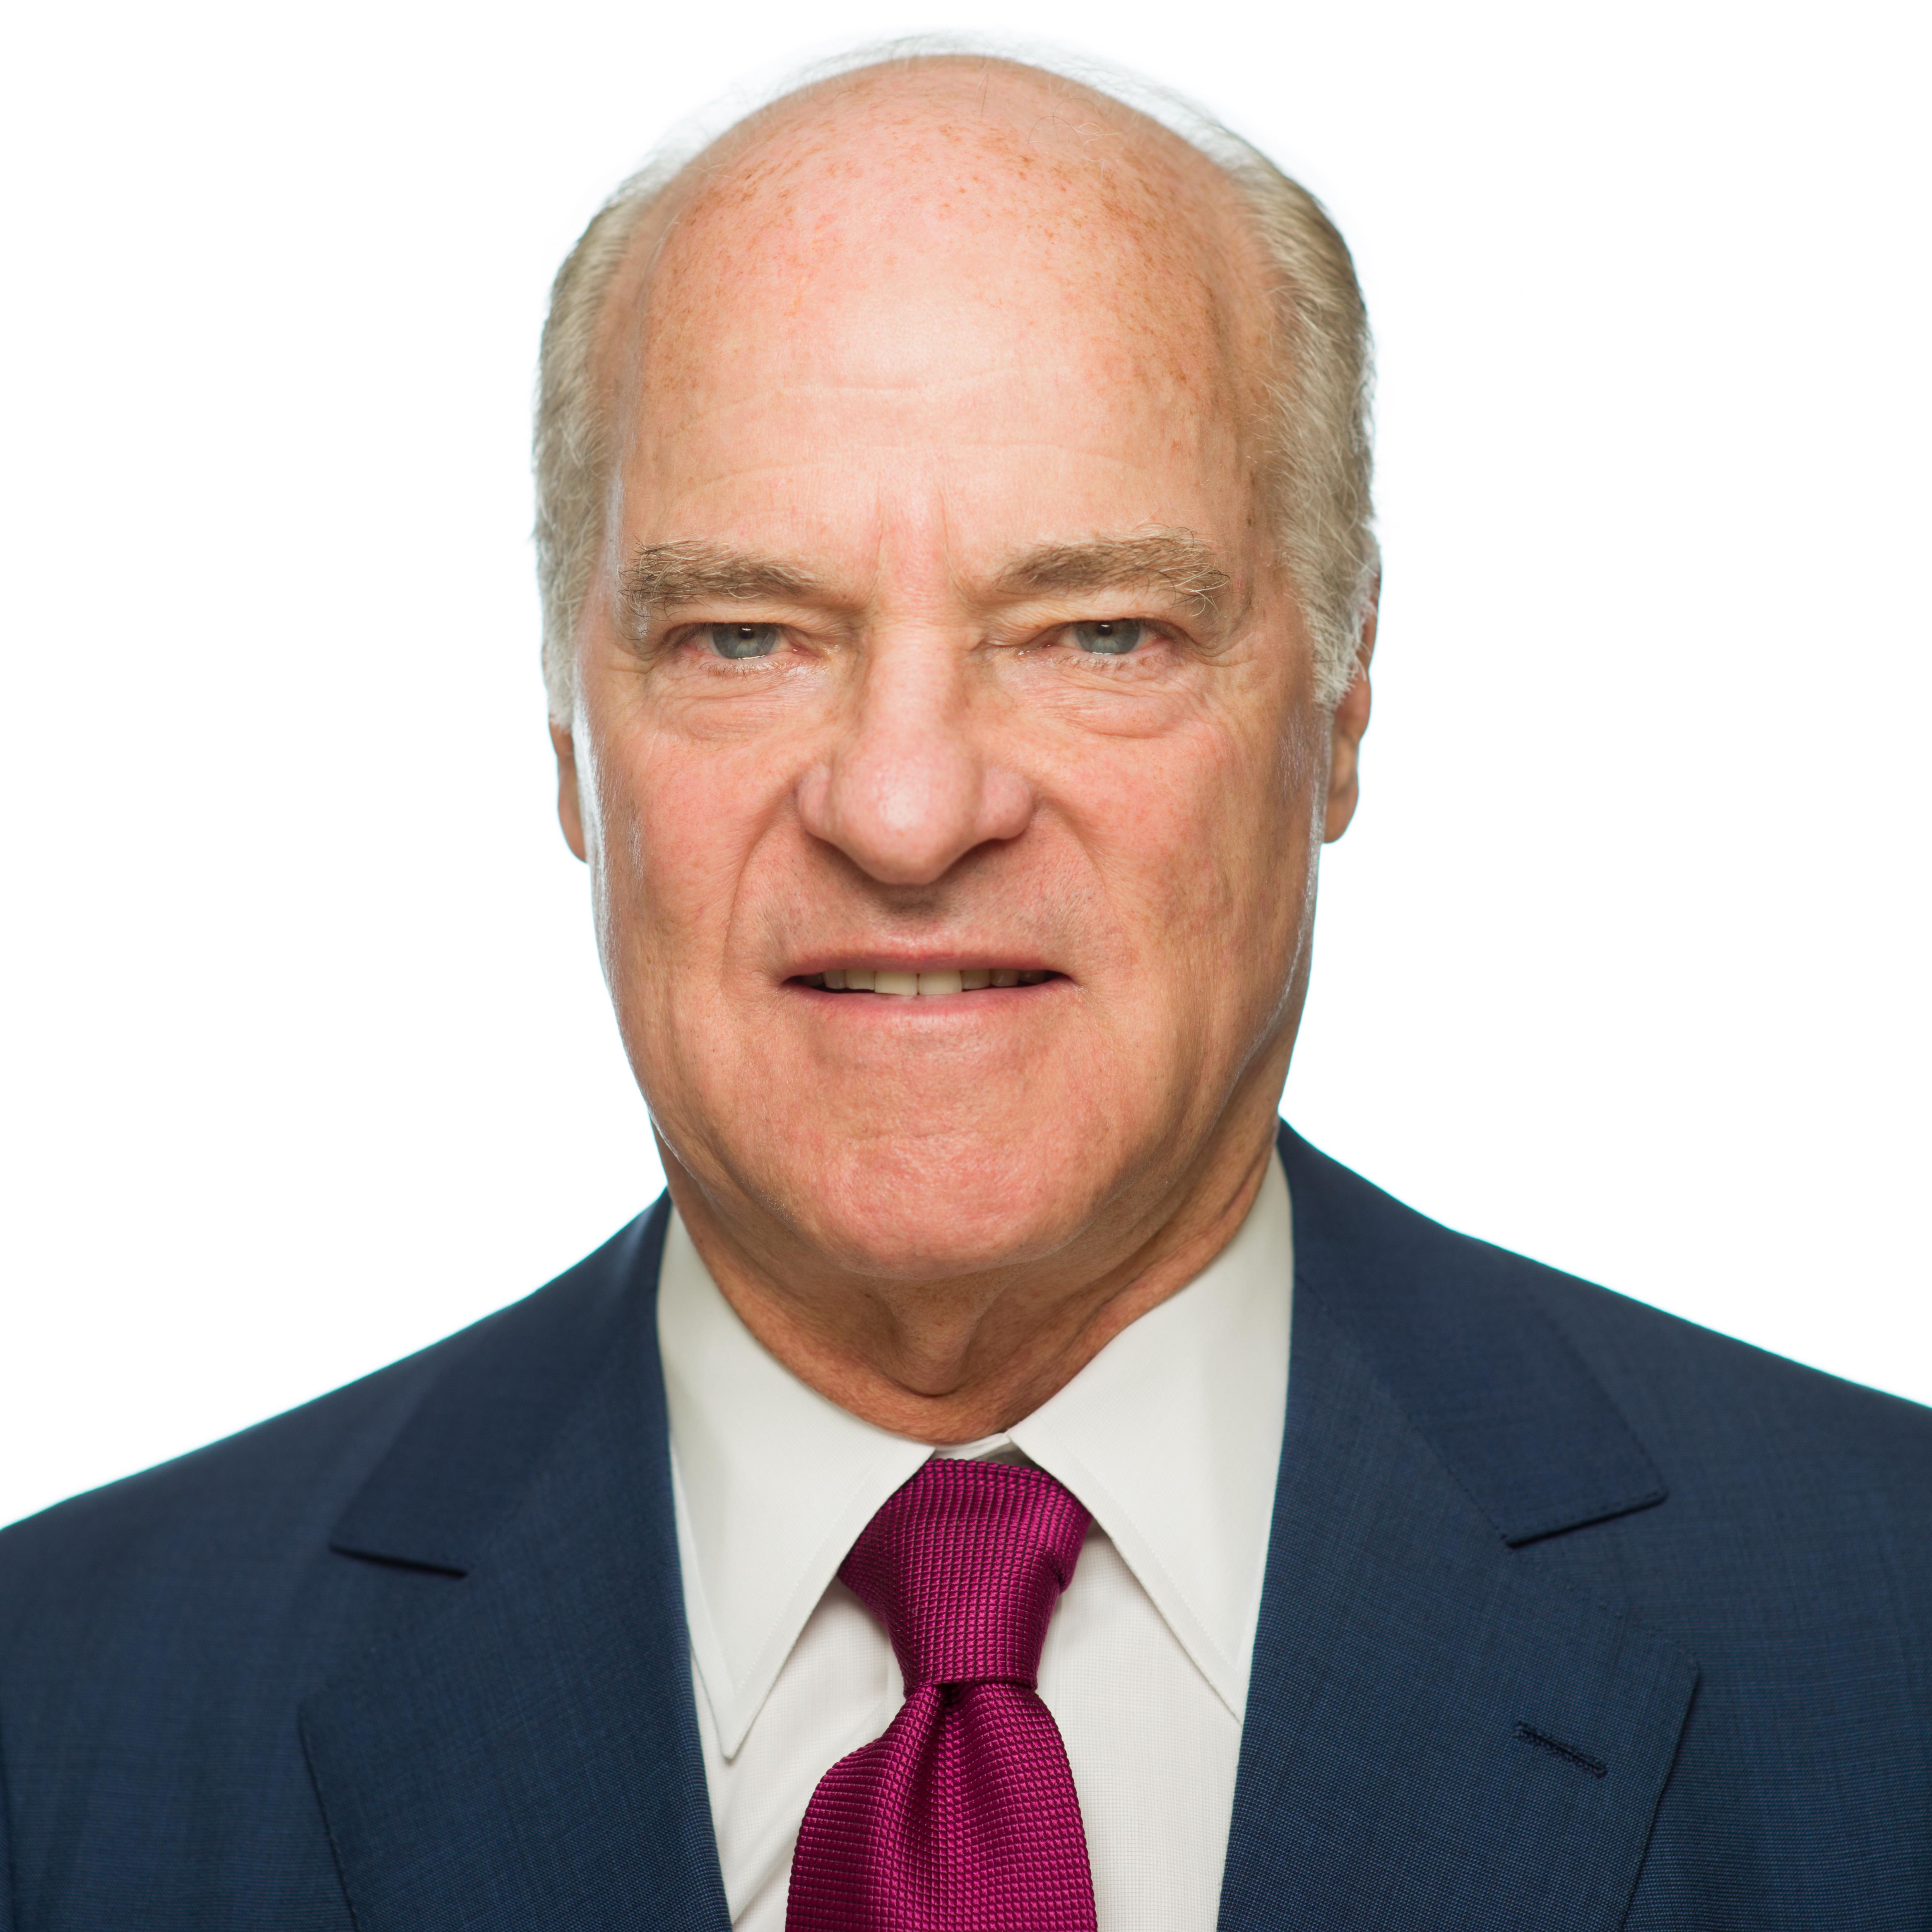 Henry Kravis, Co-Chairman and Co-CEO of KKR (Photo: Business - Henry%2BKravis_2013_v1